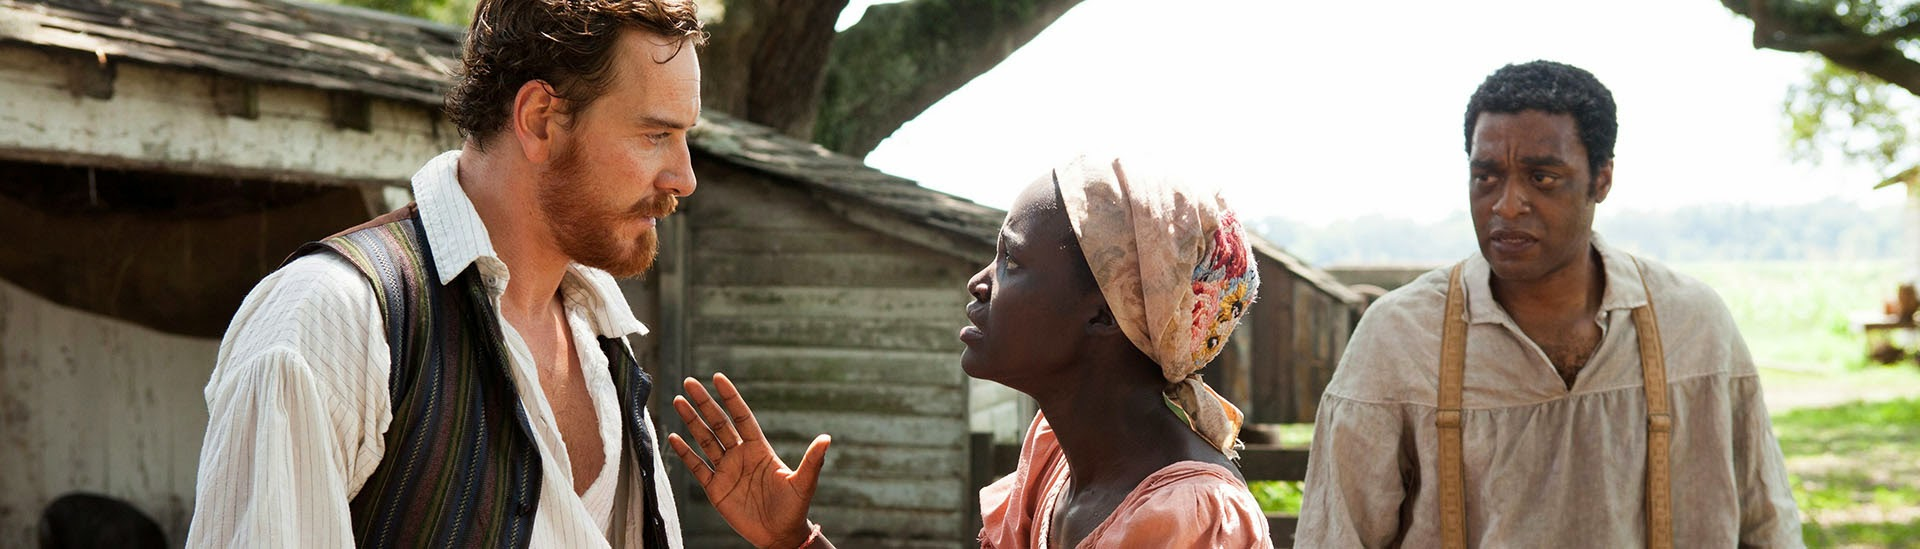 Baner filmu 'Zniewolony. 12 Years A Slave'